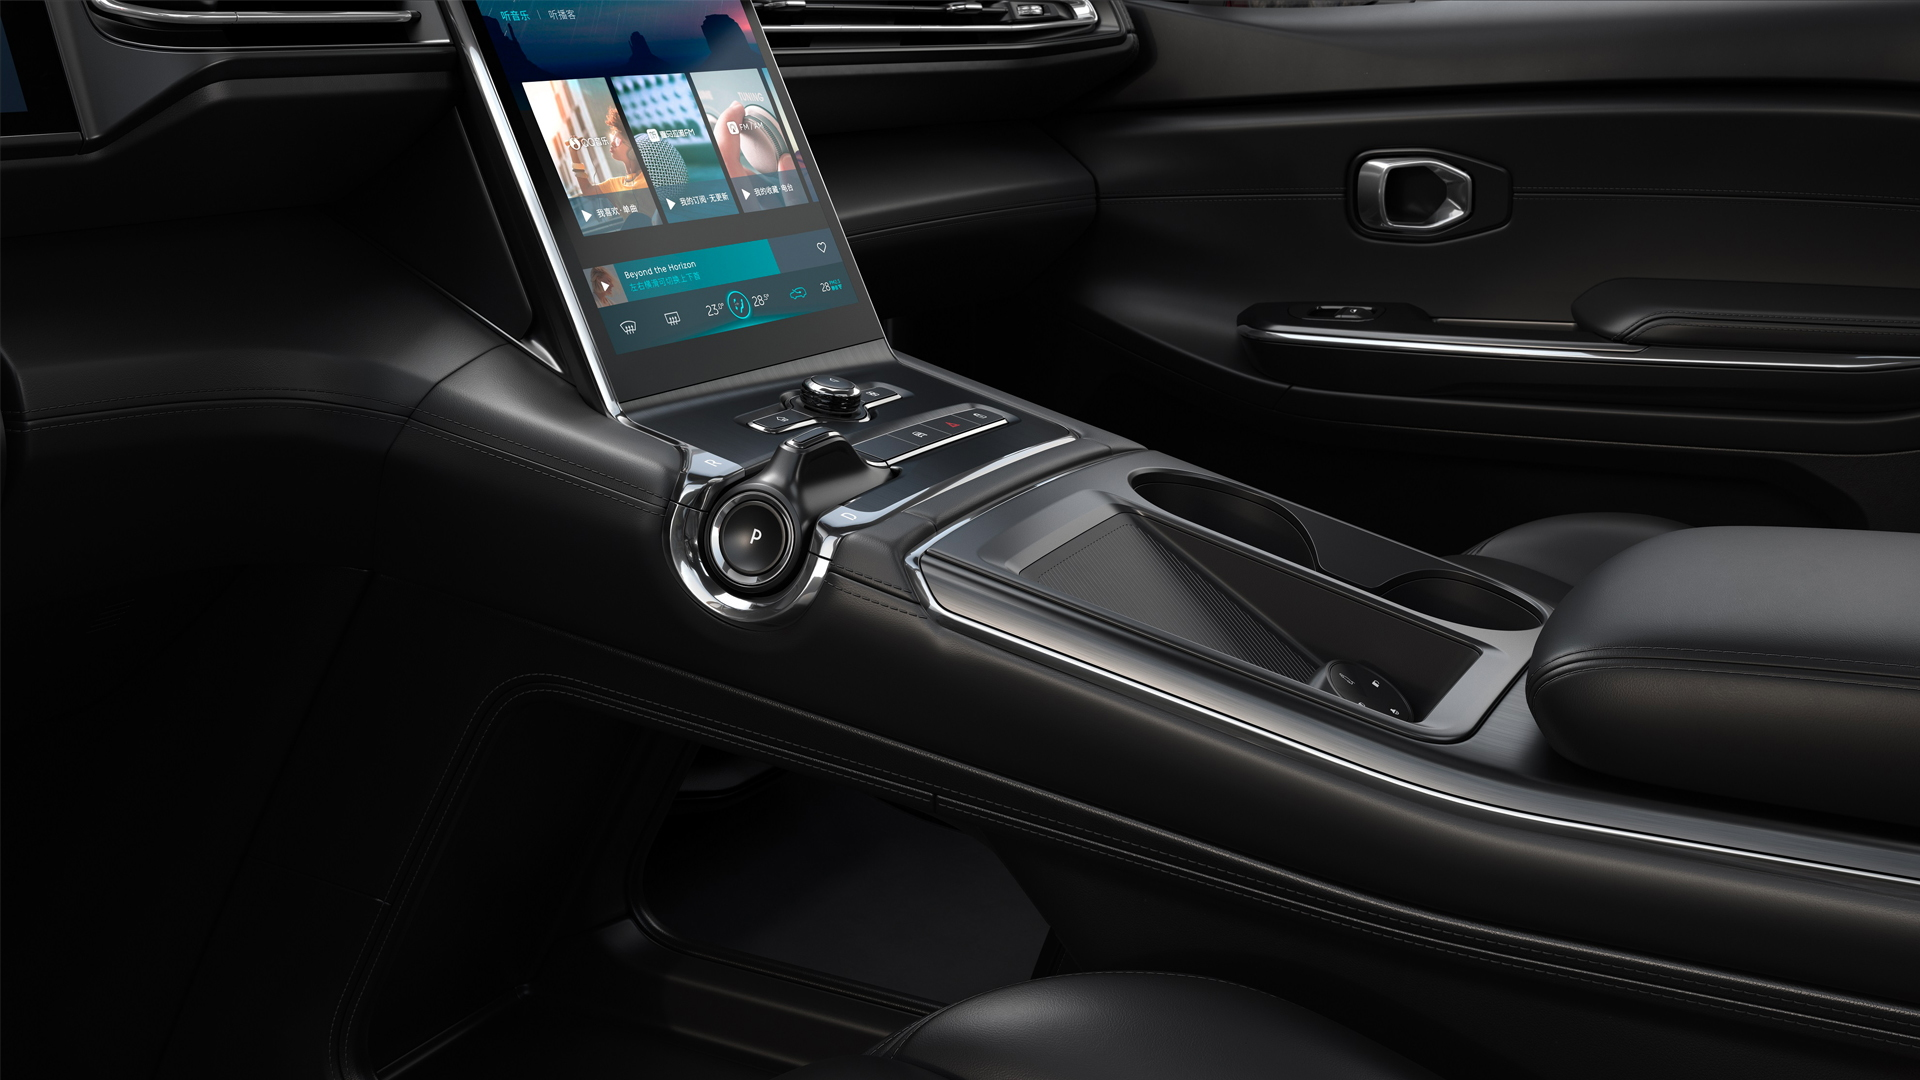 2019 Nio ES6 center console controls